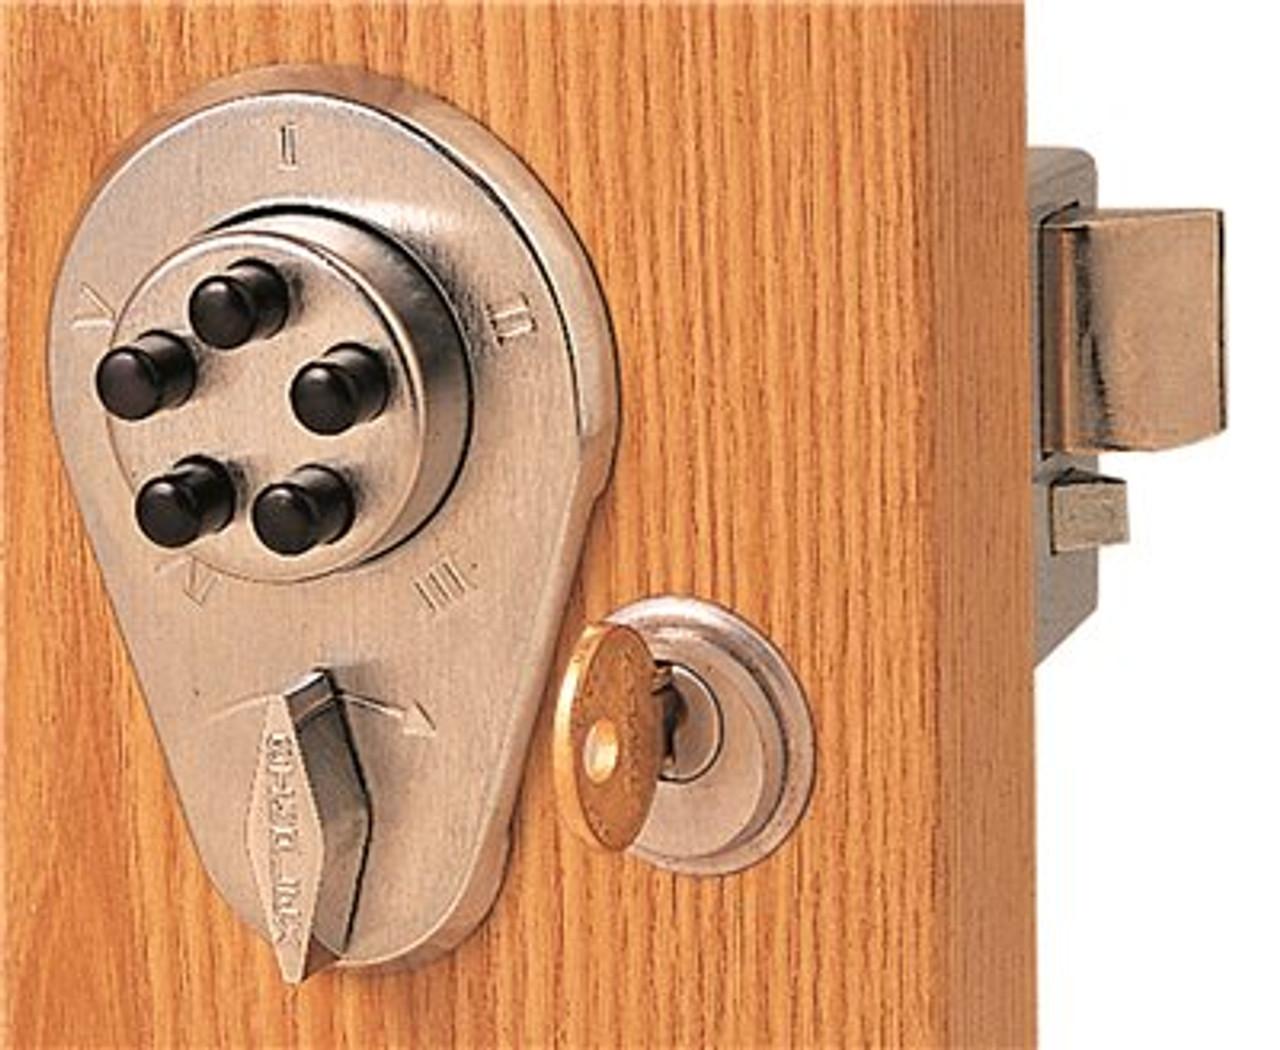 Kaba Simplex 900 Series 9380000 Pushbutton Lock w/Key Override